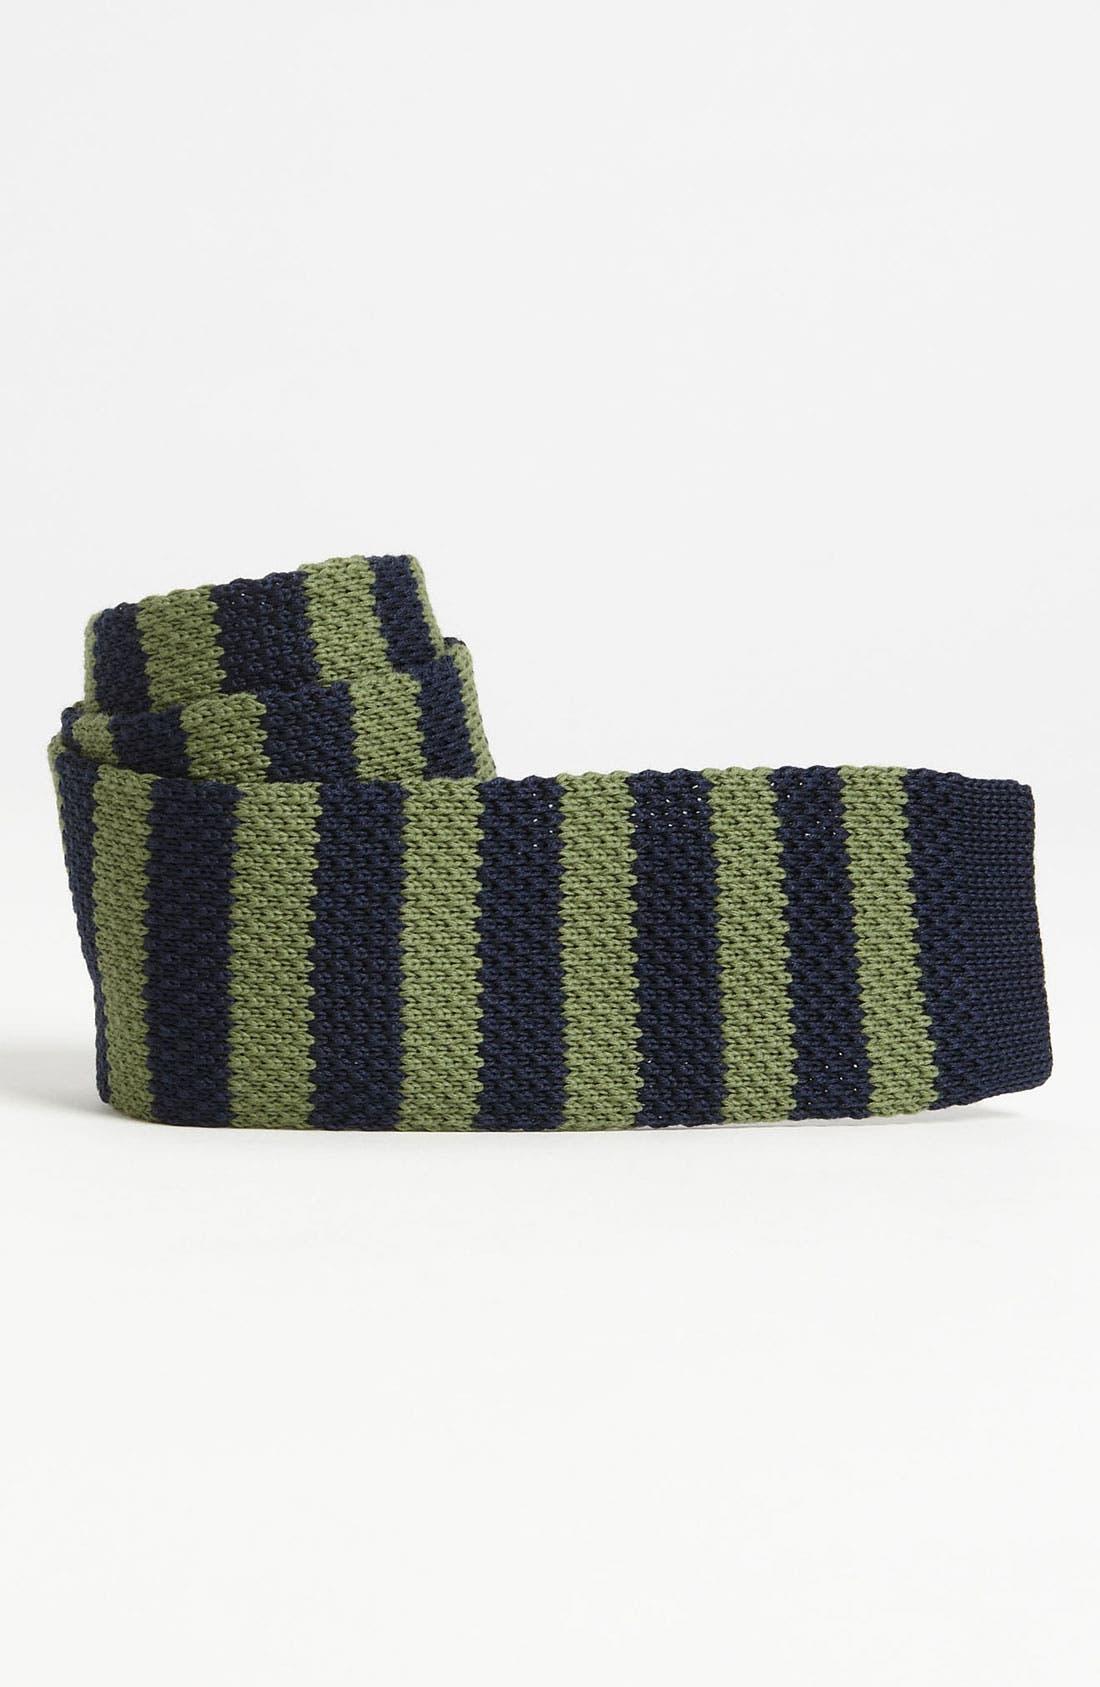 Alternate Image 1 Selected - Nordstrom Knit Tie (Big Boys)